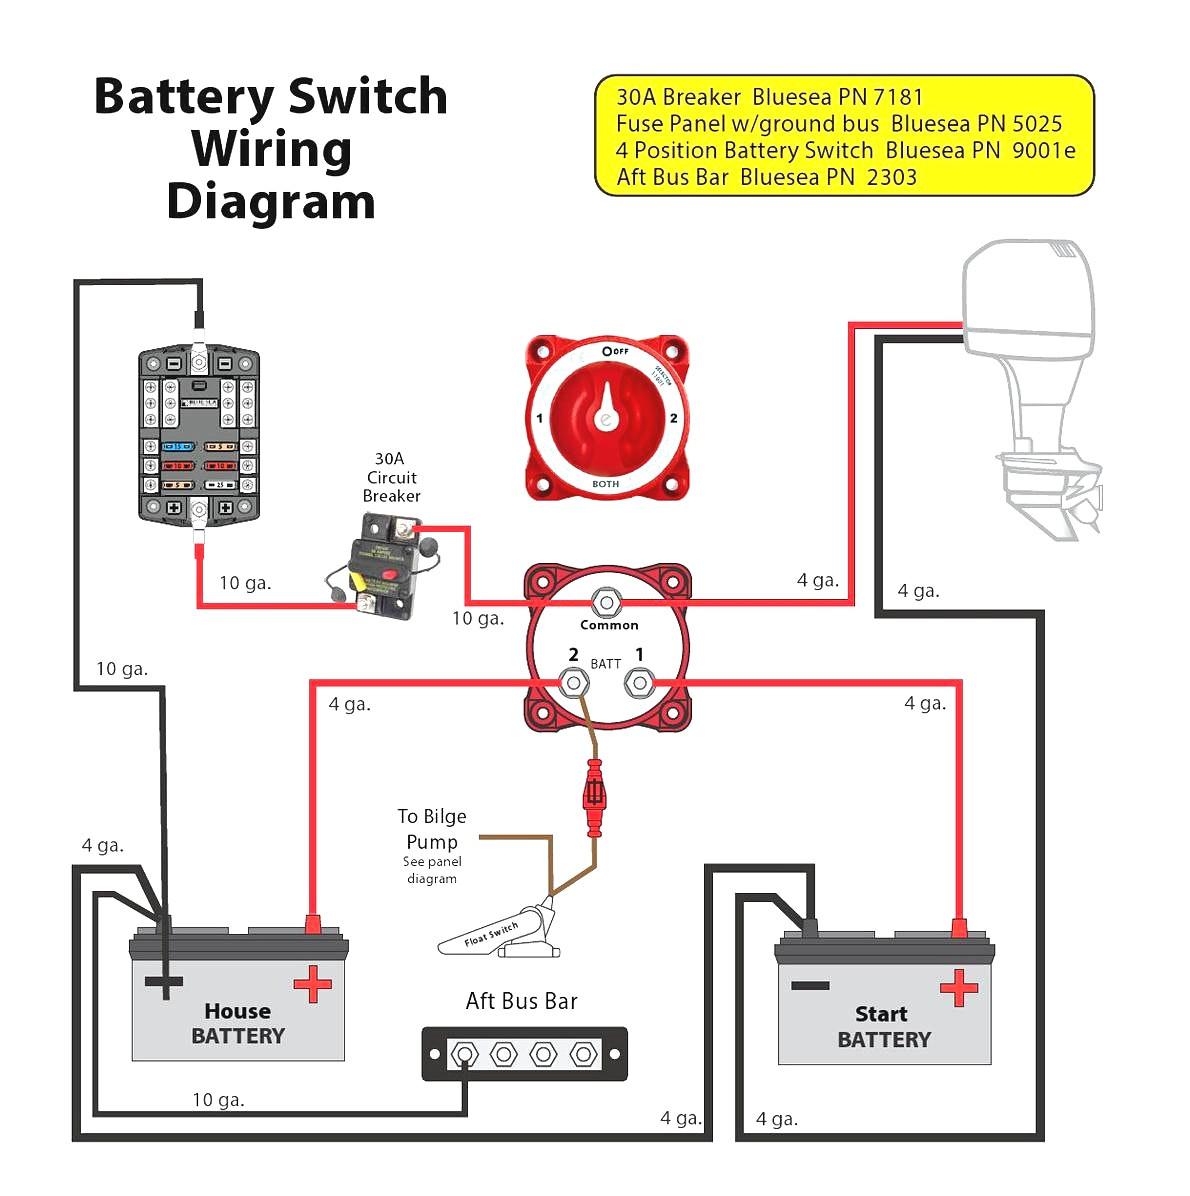 Motorhome Battery Wiring - Wiring Diagram Data - Rv Wiring Diagram